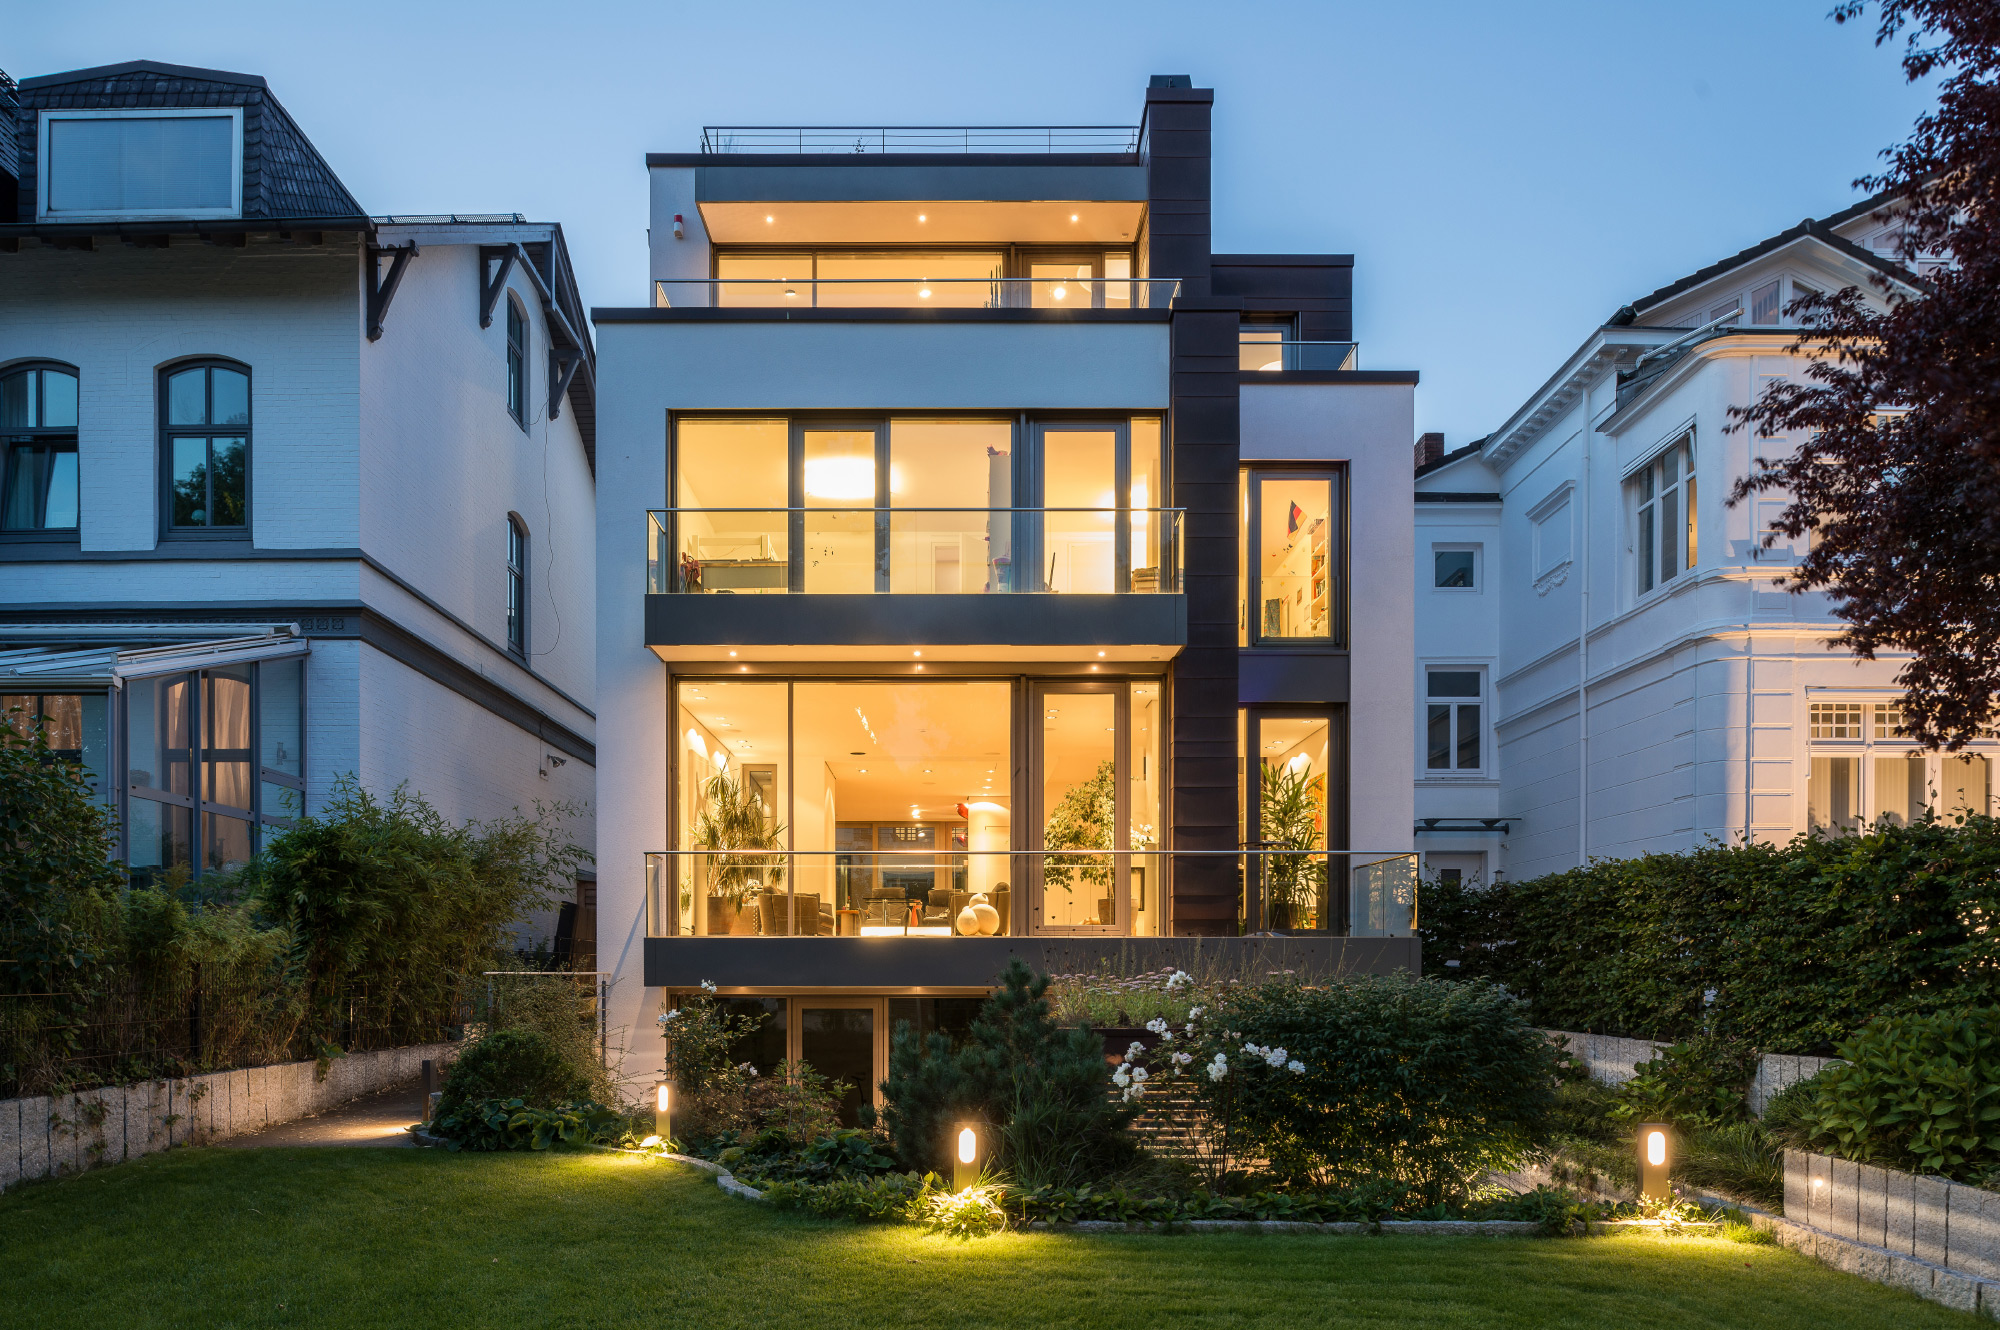 moderne stadtvilla hamburg ottensen jk architektenteam. Black Bedroom Furniture Sets. Home Design Ideas